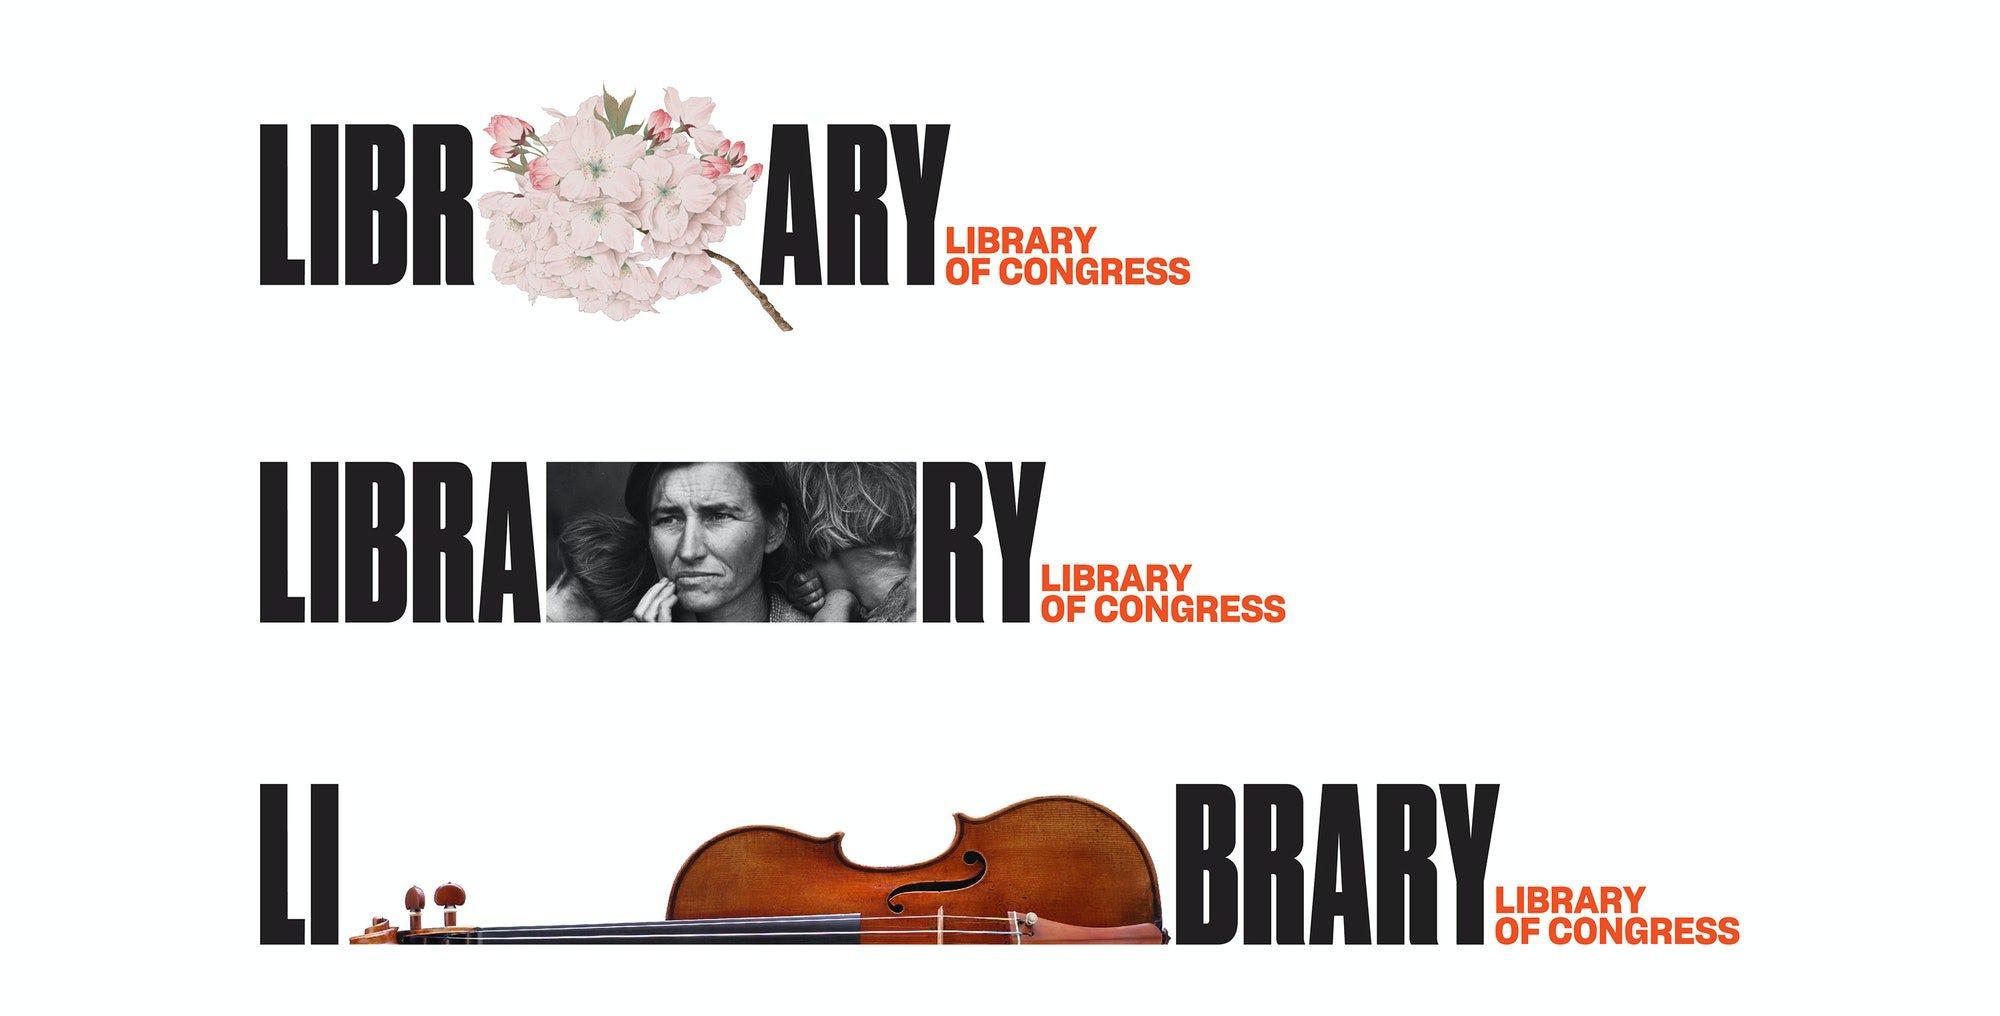 Логотип Library of Congress